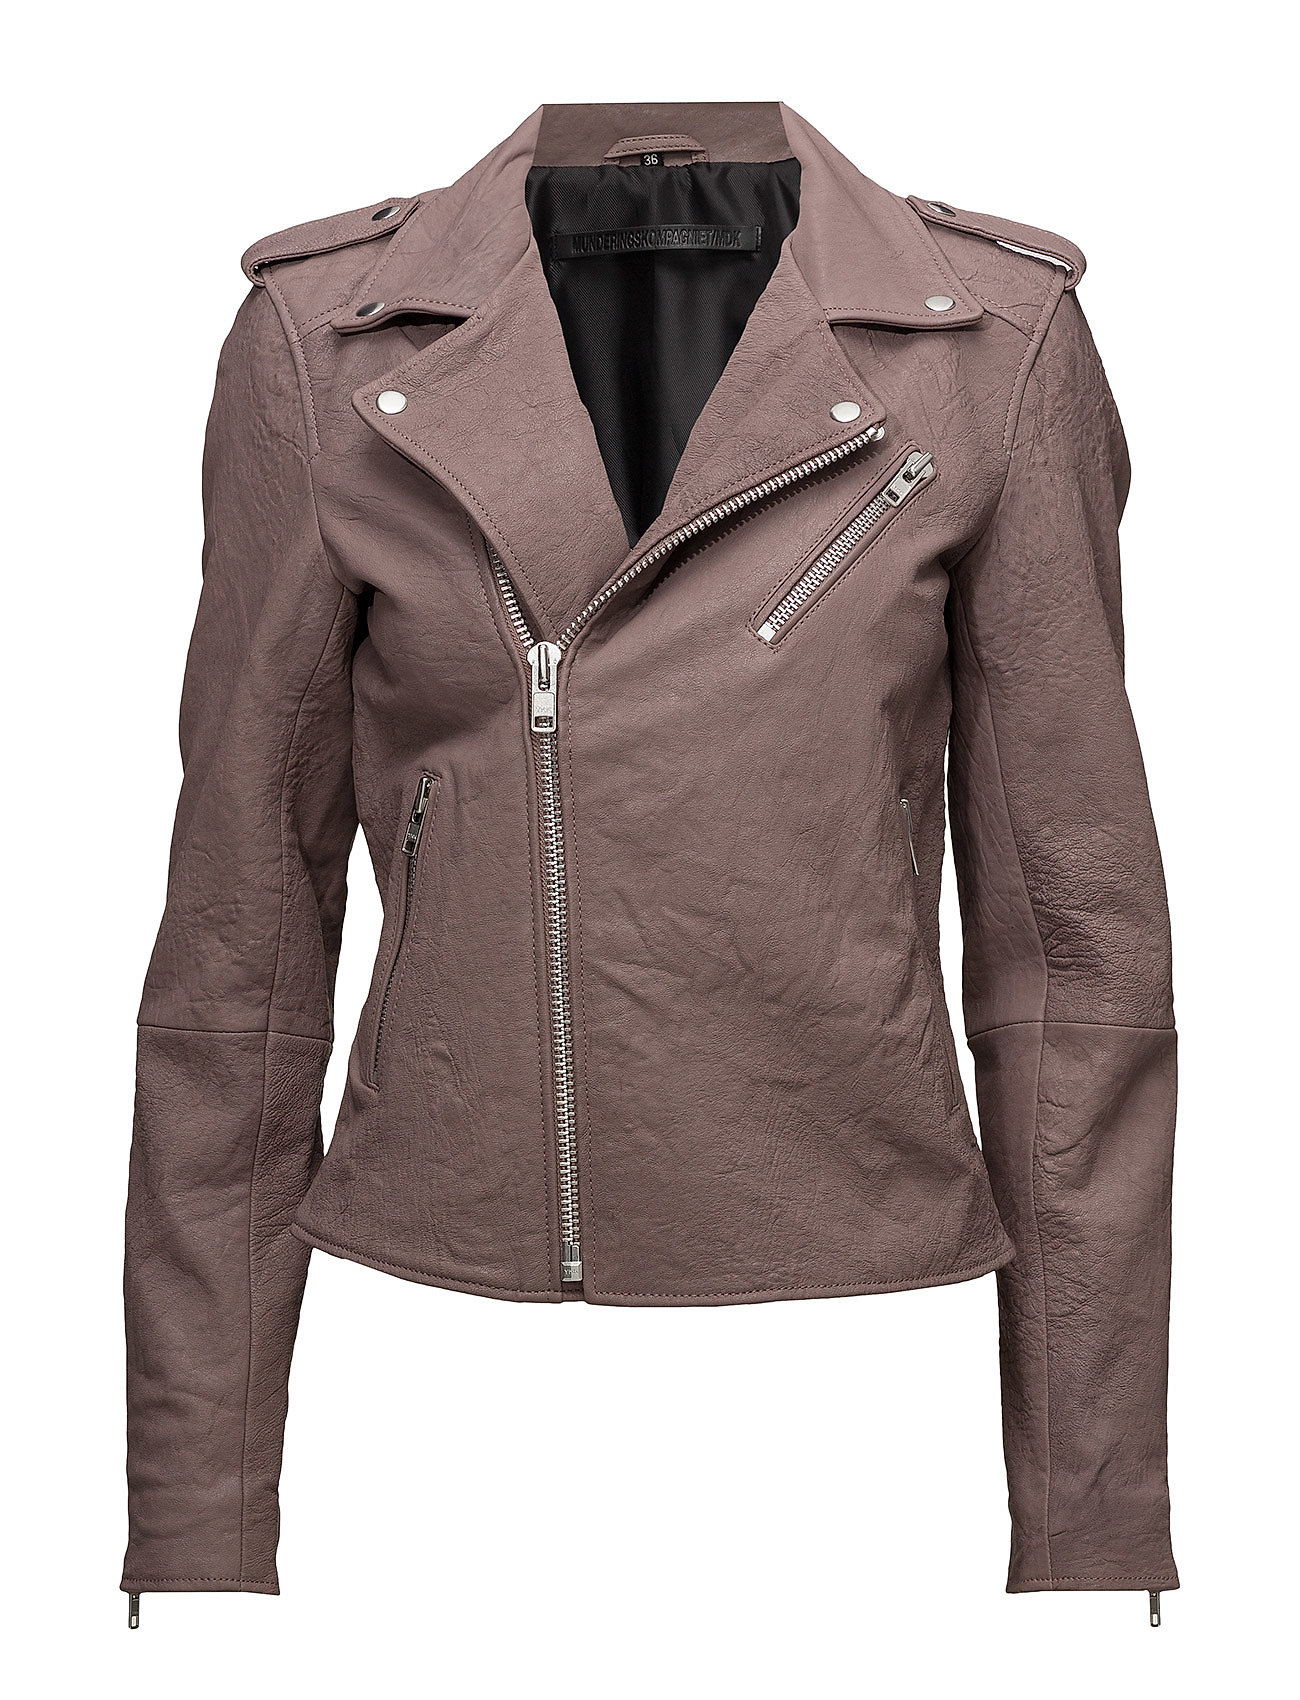 MDK / Munderingskompagniet Bubble biker jacket (antler rose)